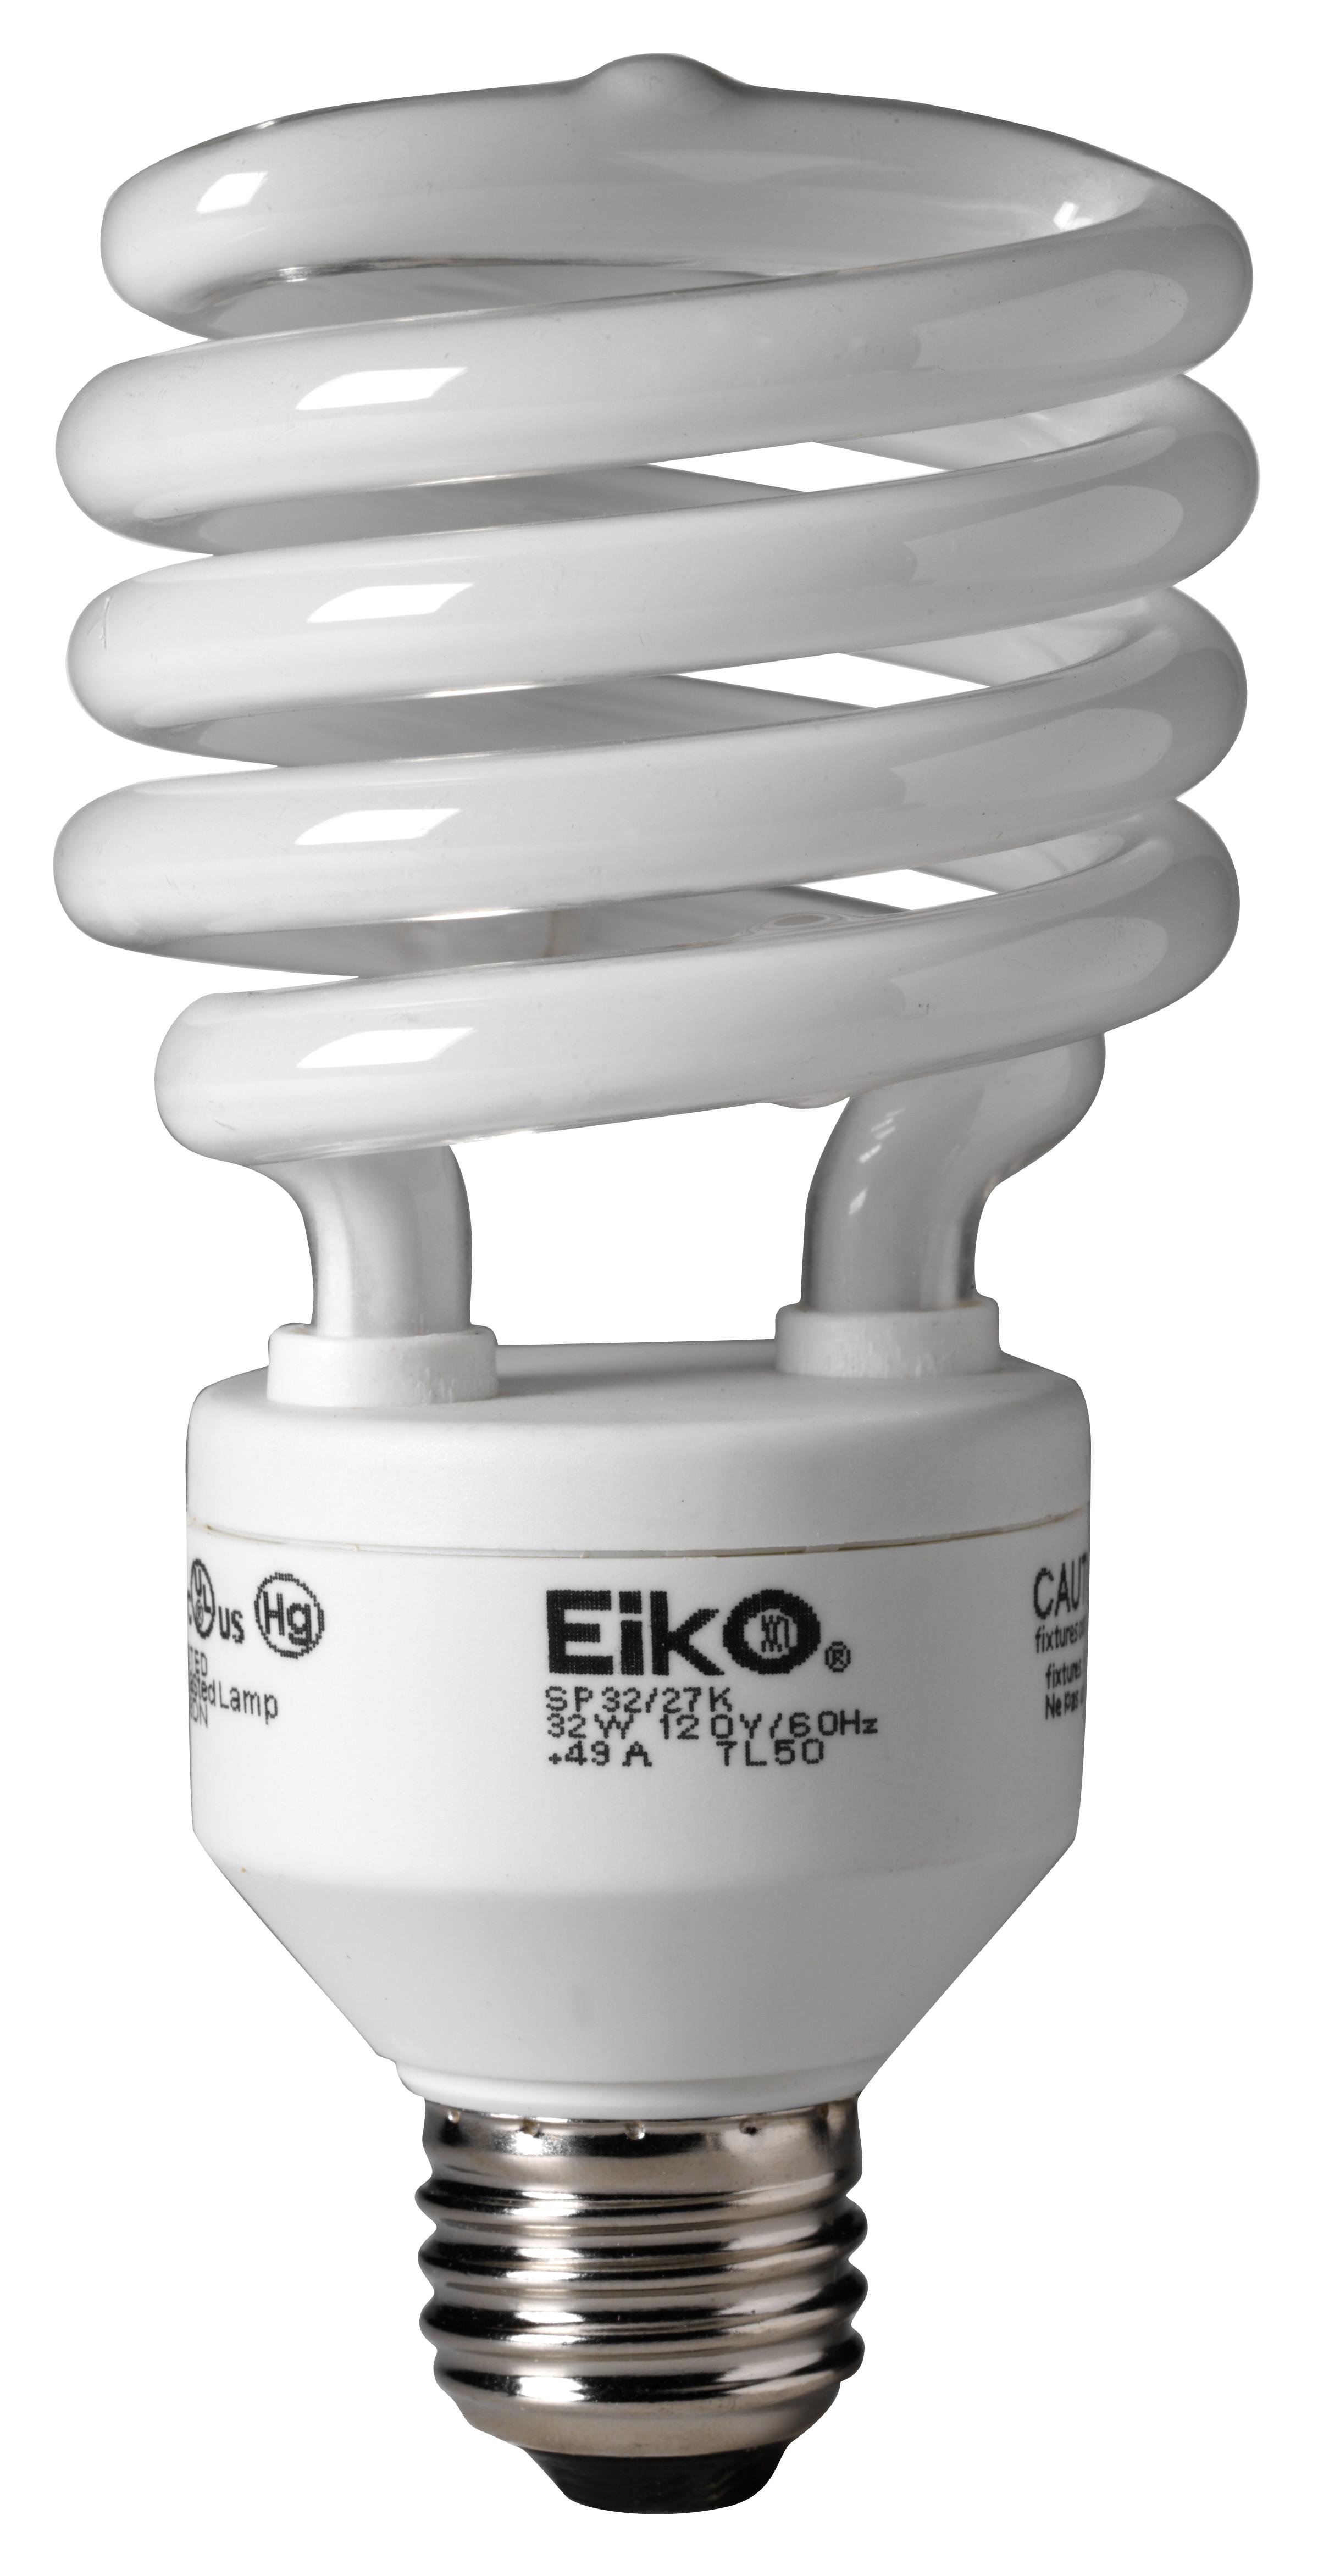 Eiko SP32/50K